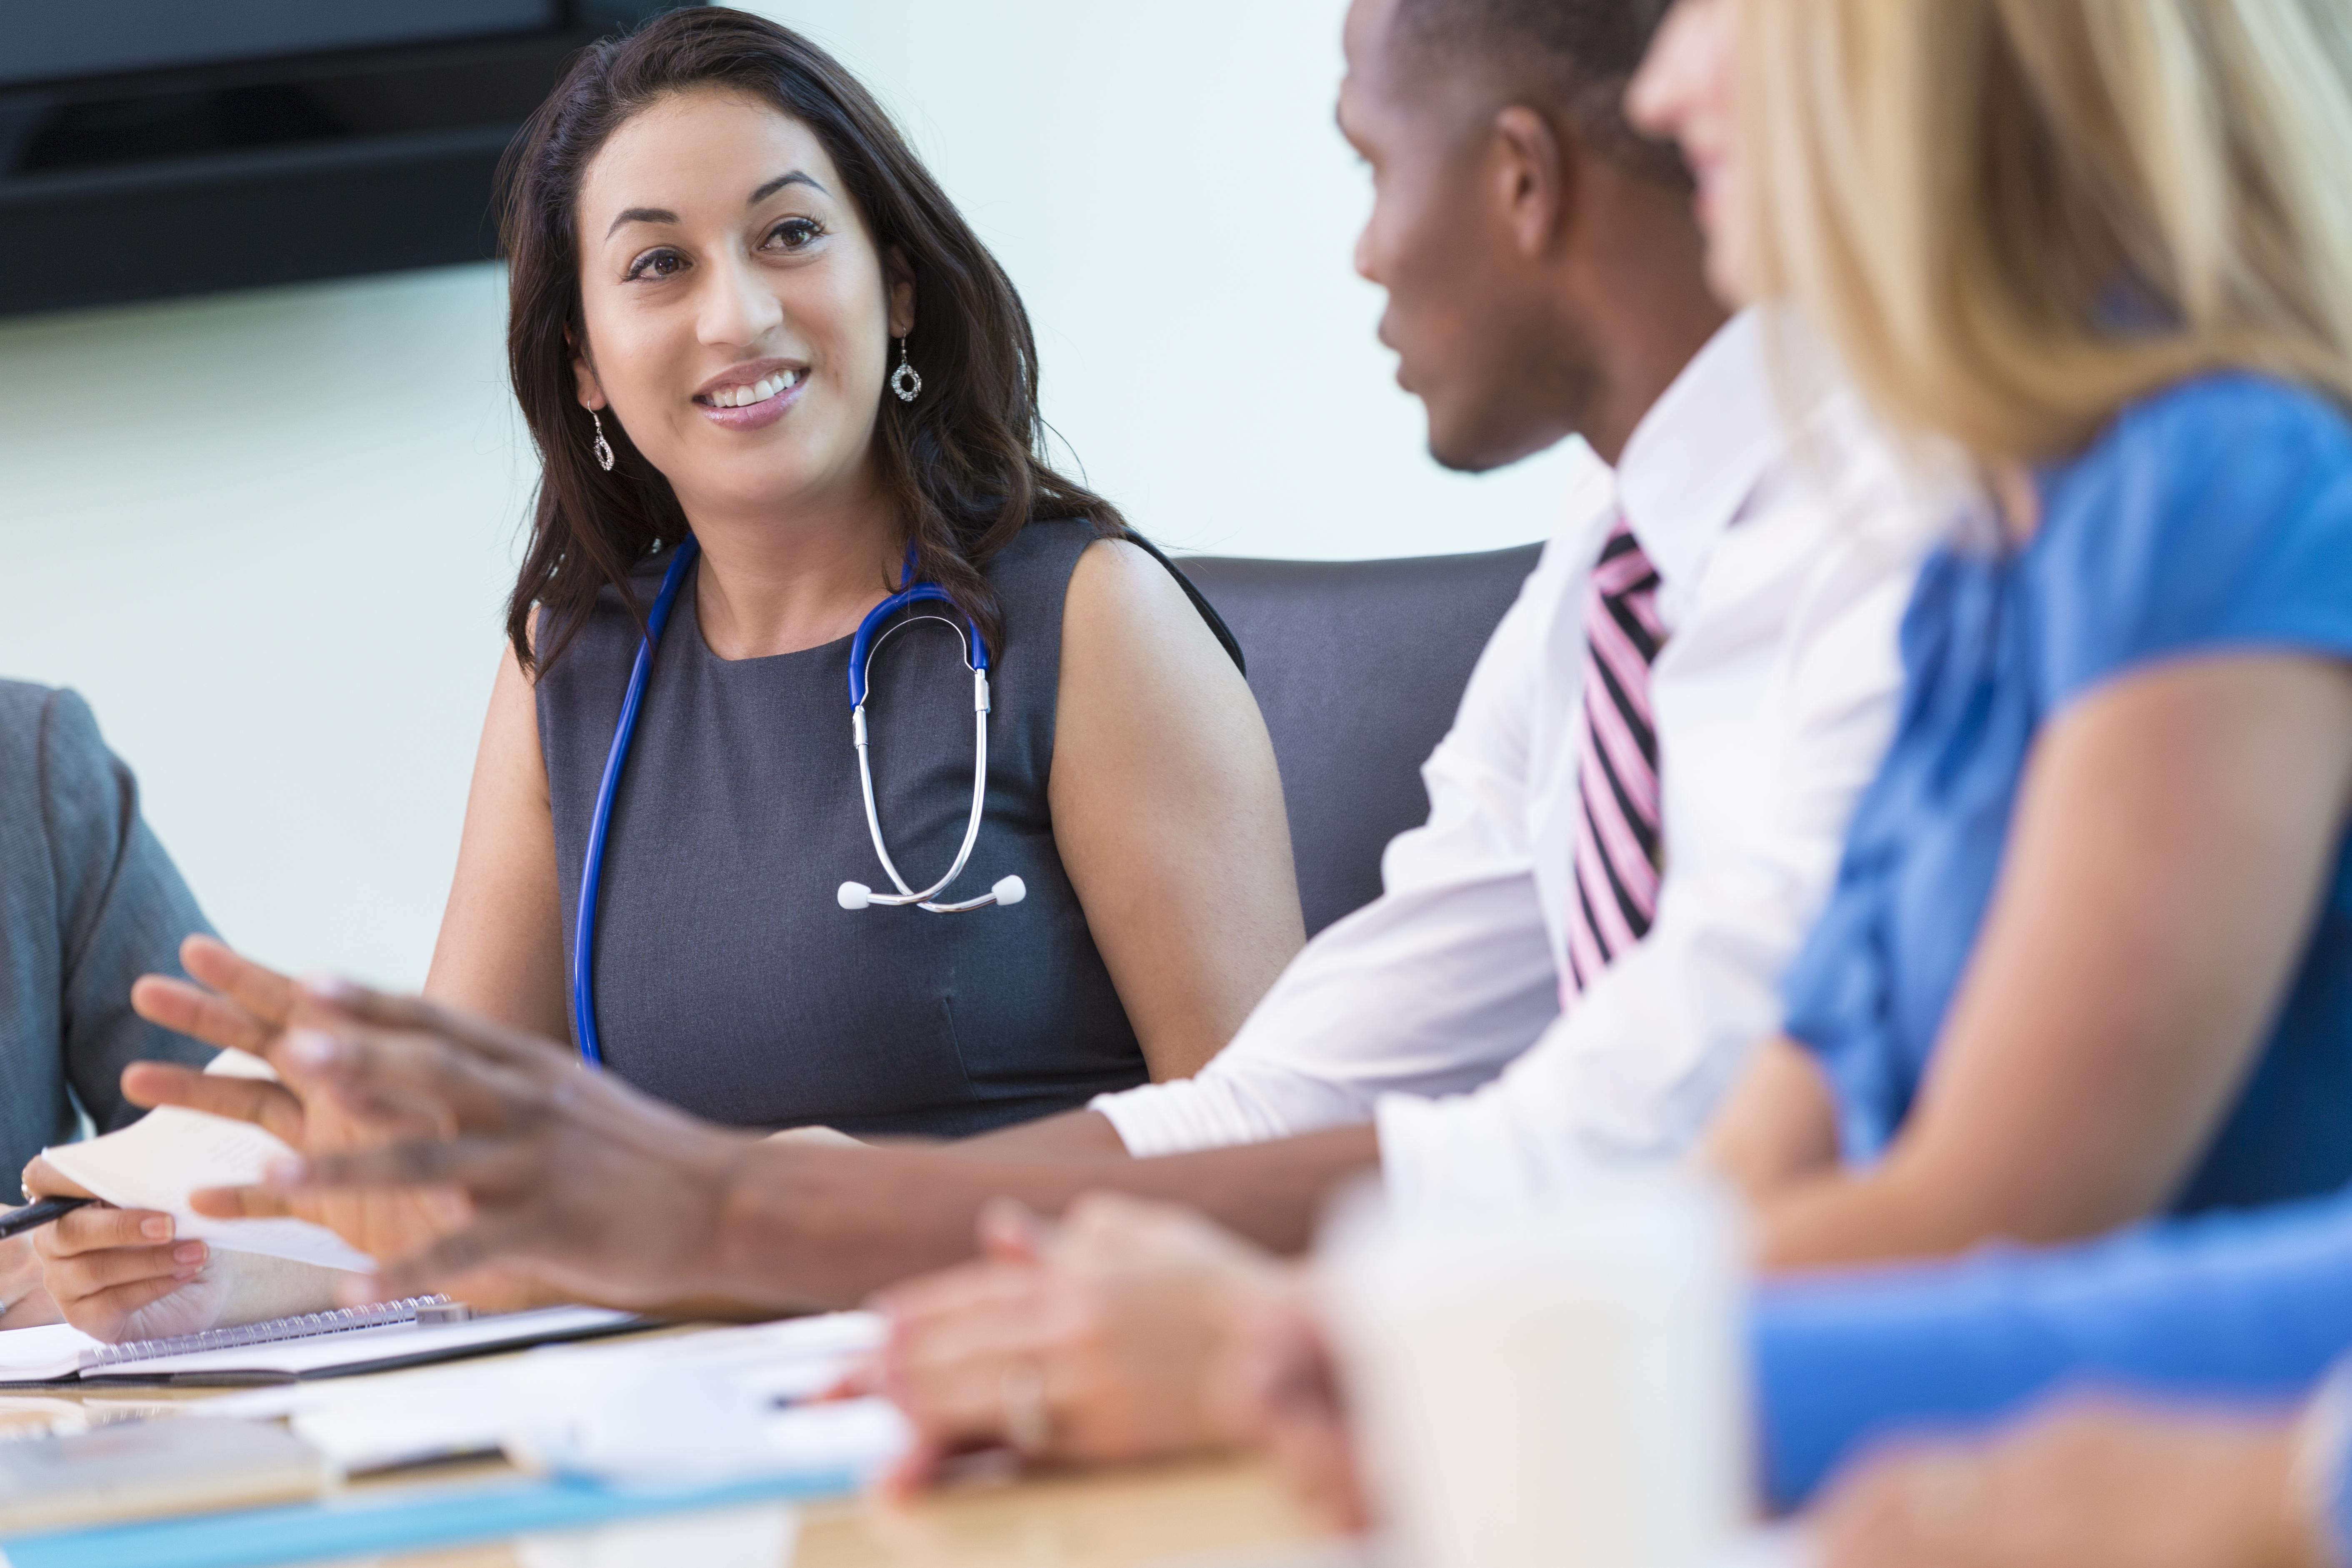 Medical Indemnity Insurance Australia